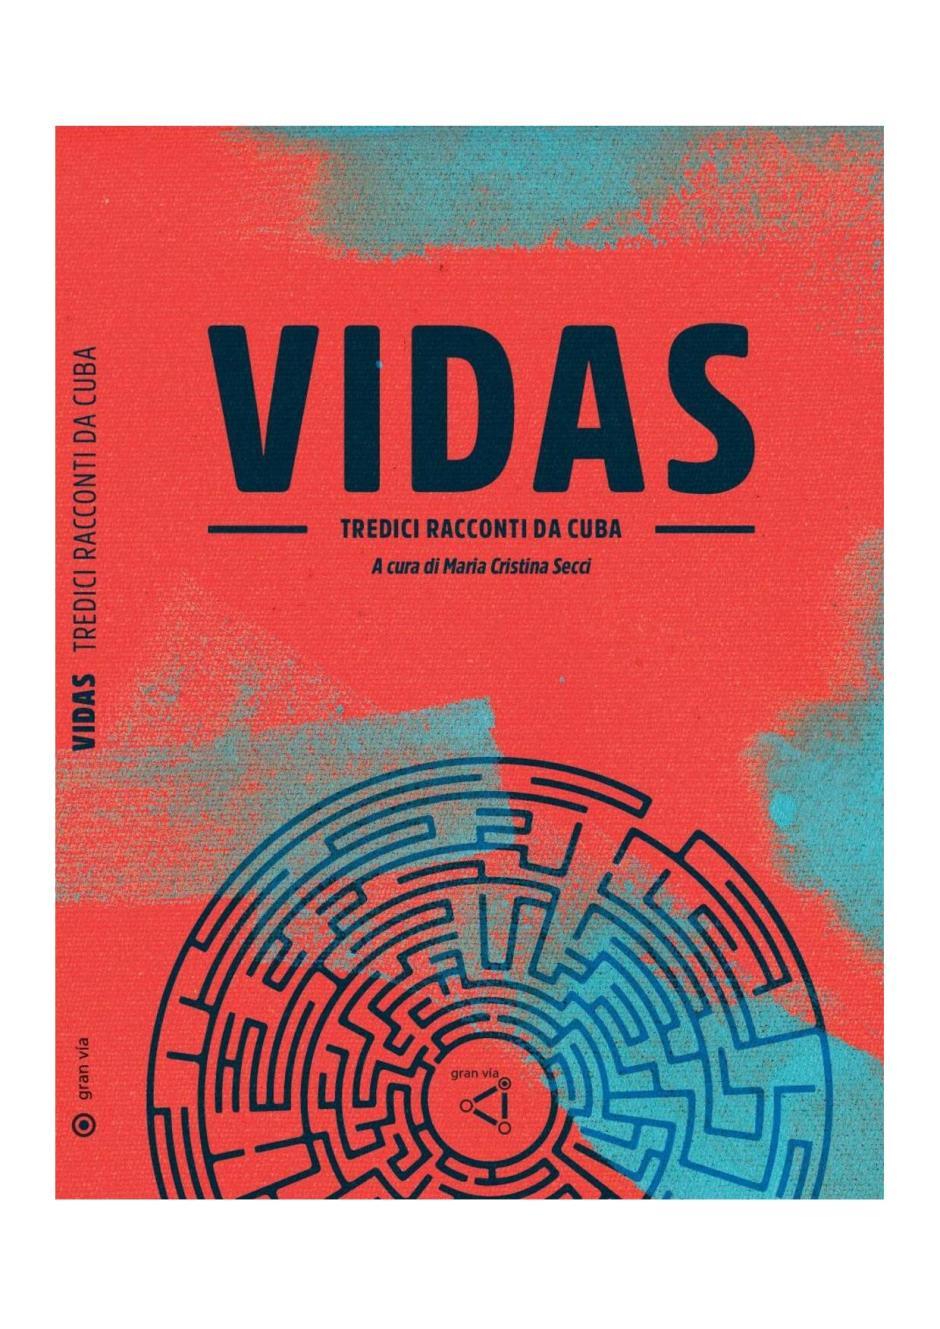 copertina-vidas-page-001